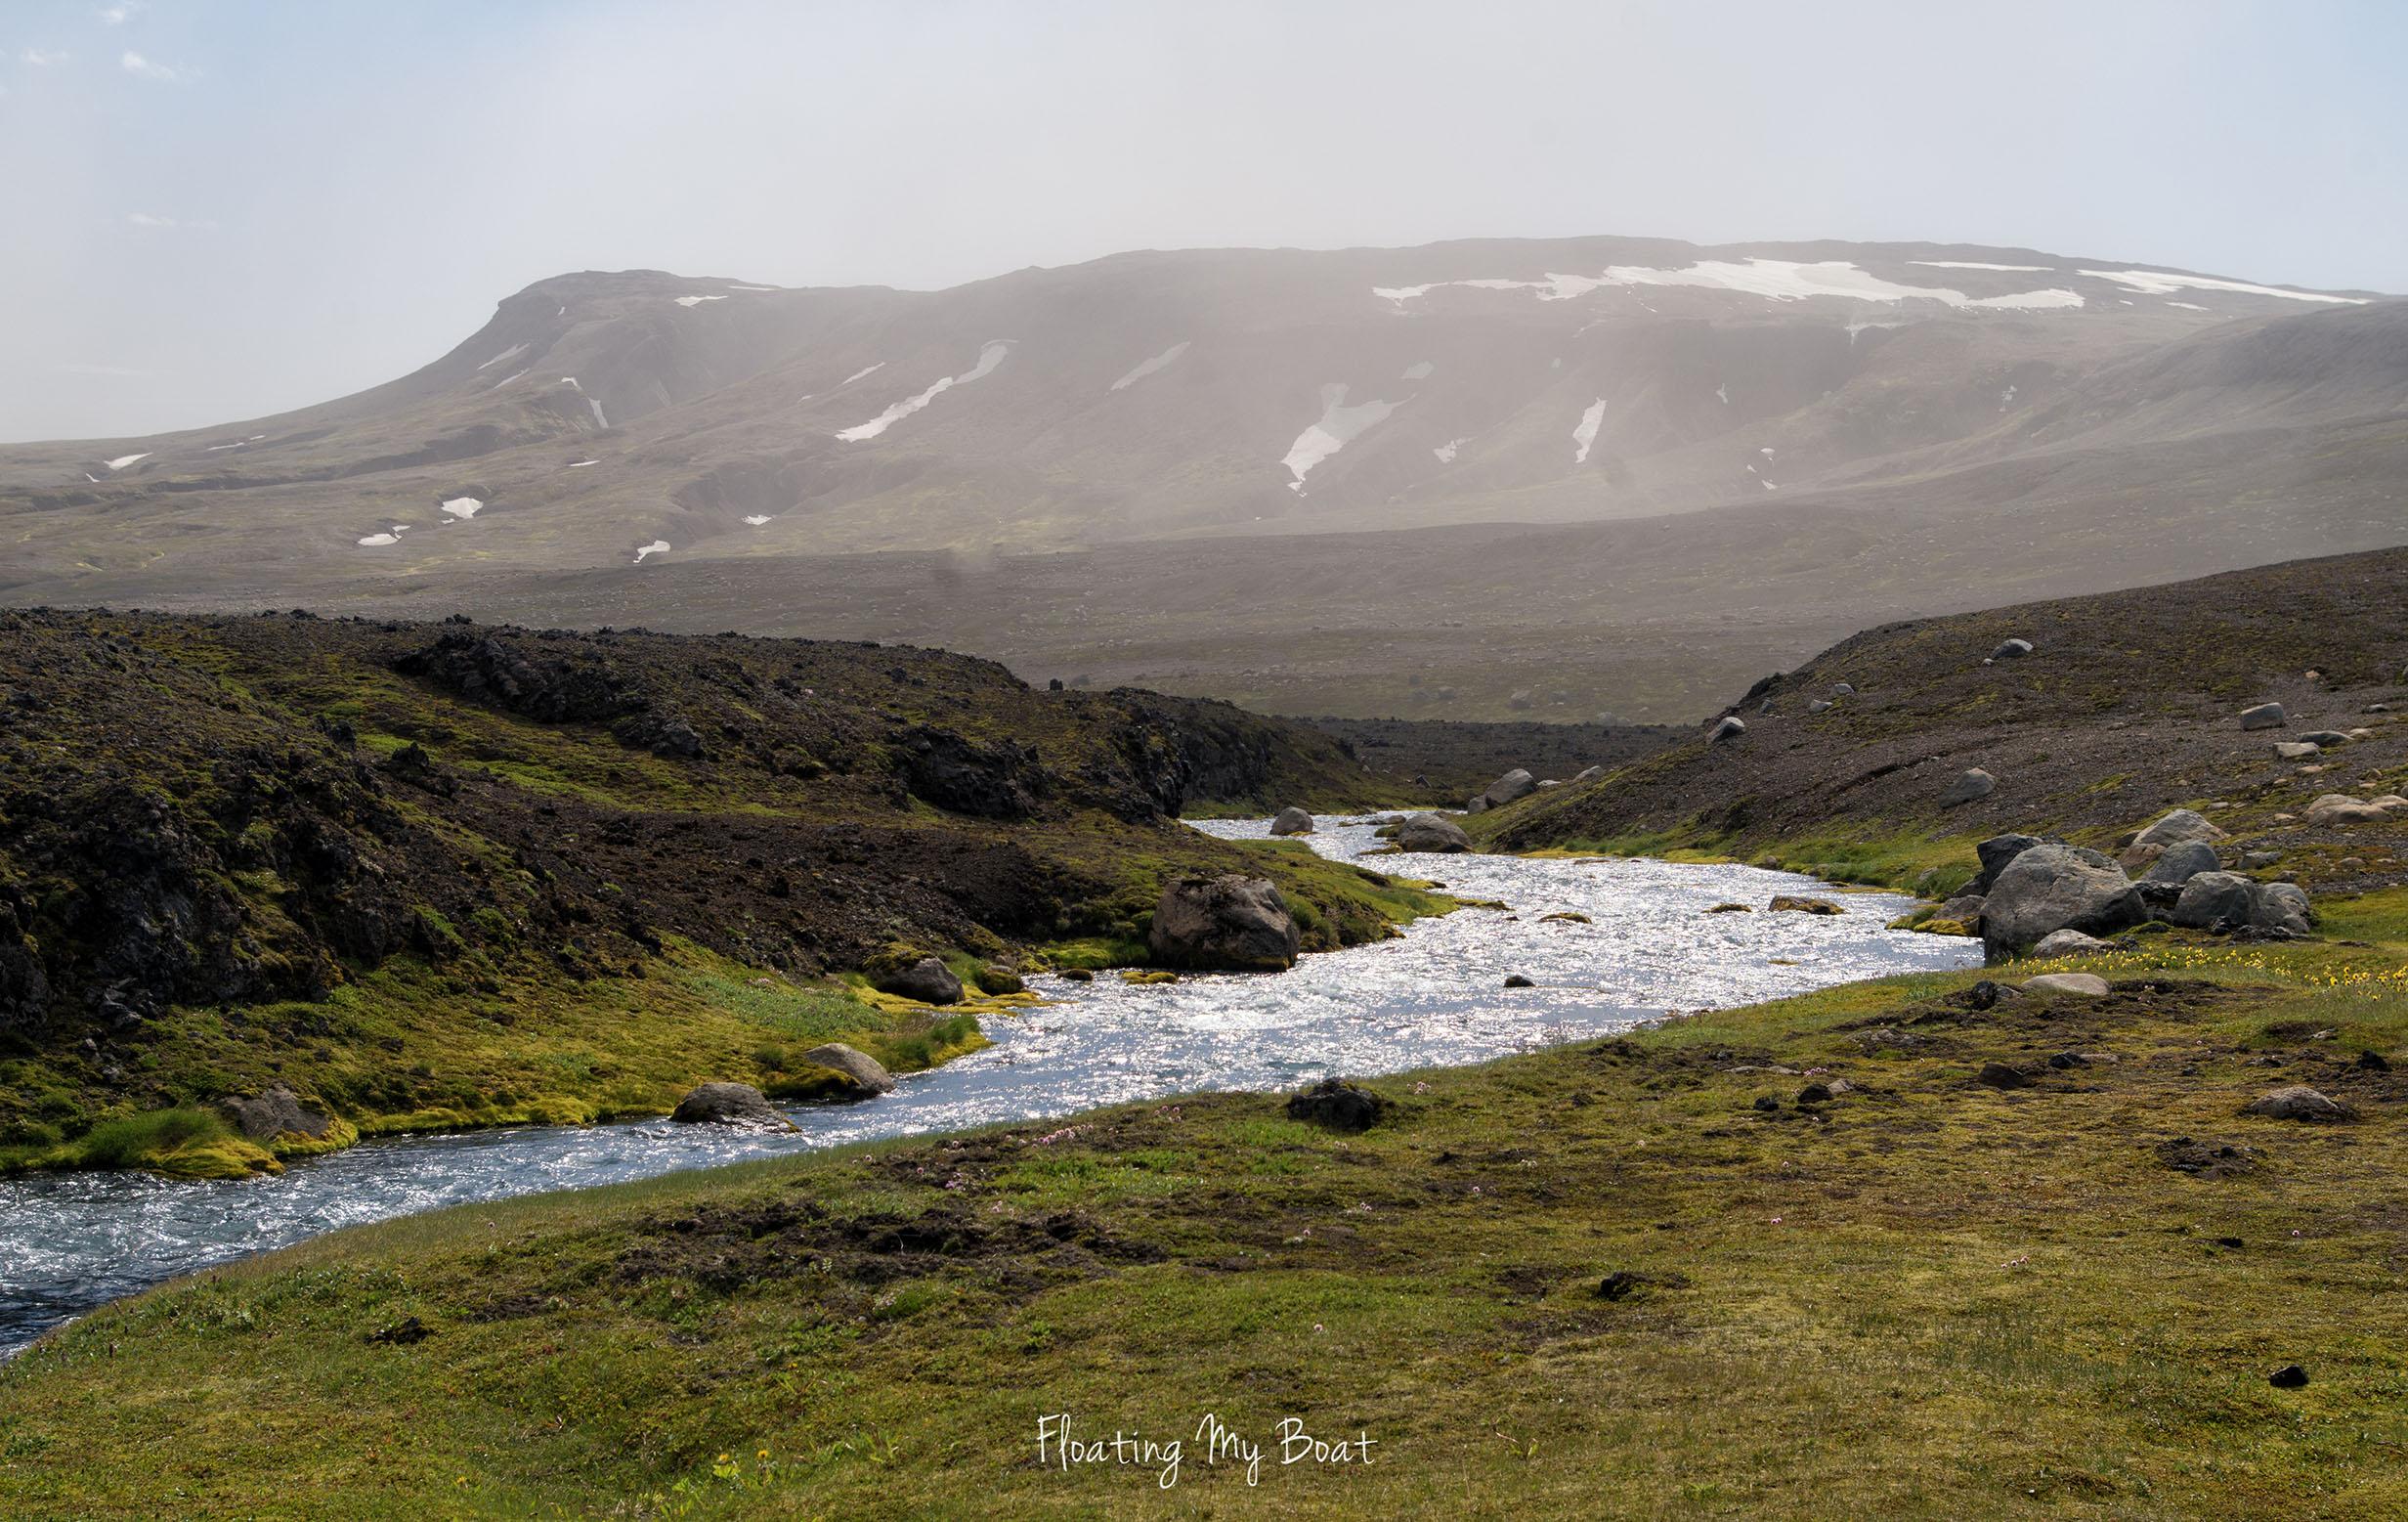 trekking-iceland-vatnajokull-national-park-51